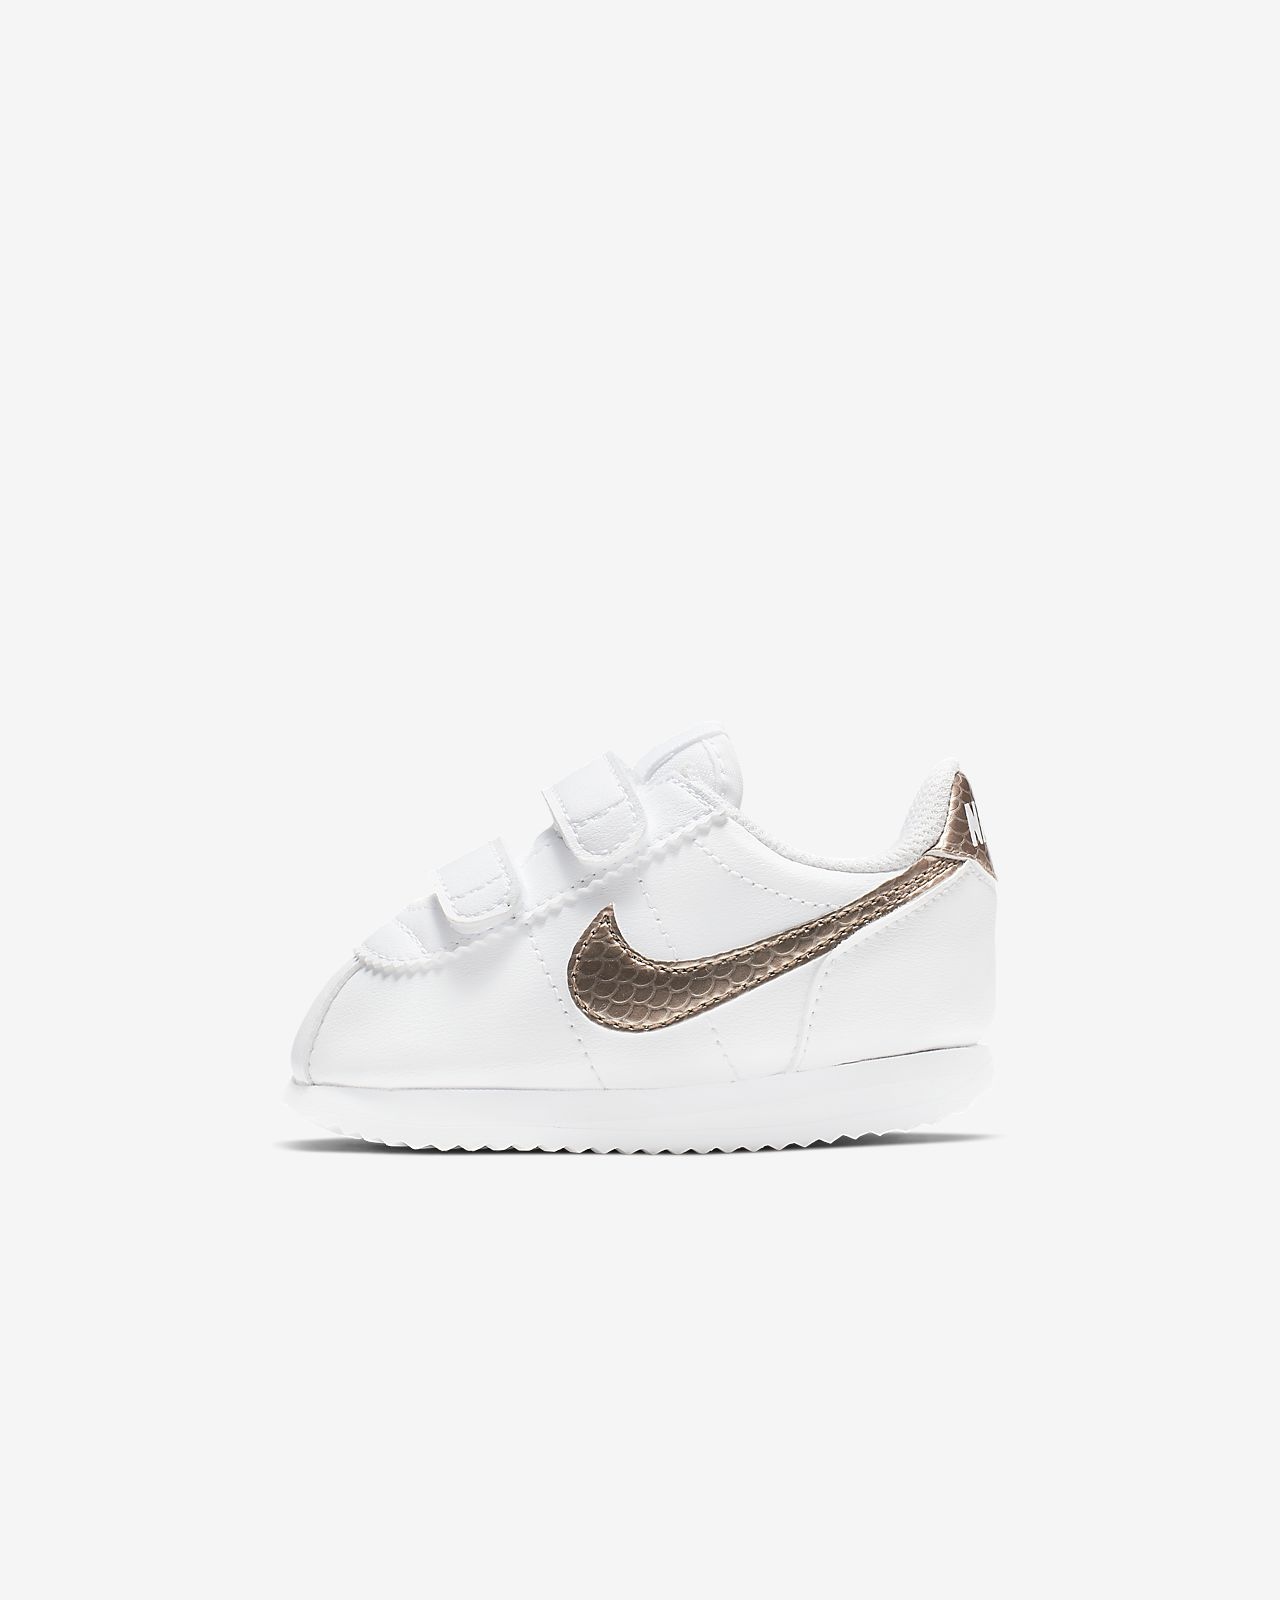 Nike Cortez Basic SL EP 嬰幼兒鞋款